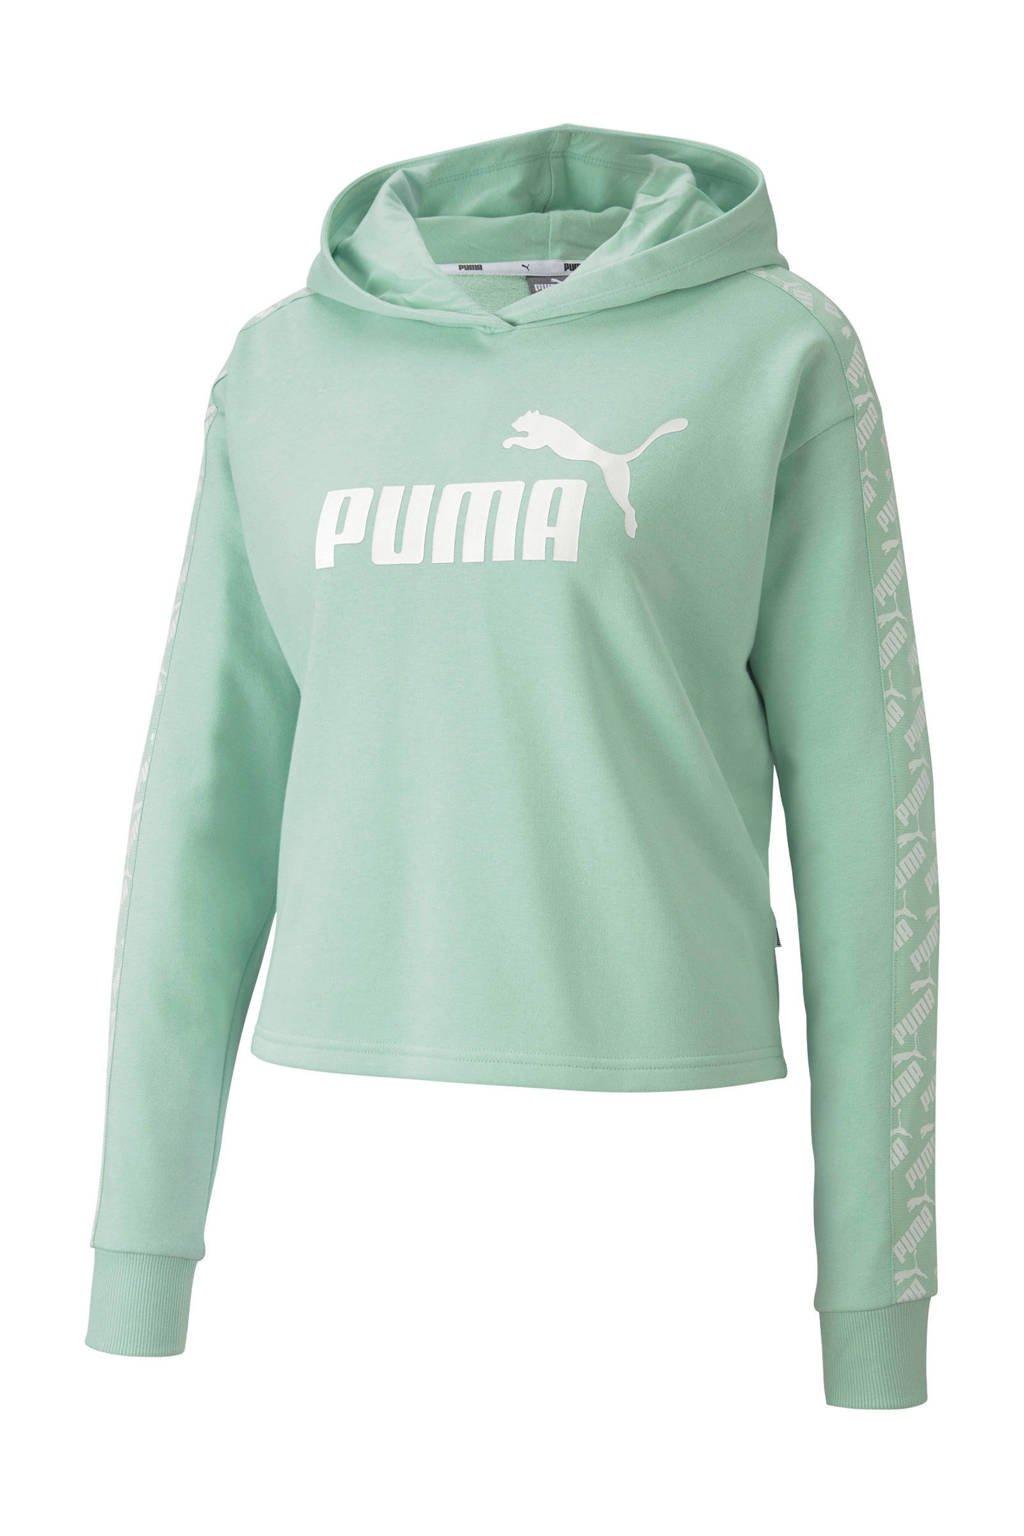 Puma cropped hoodie mintgroen, Mintgroen